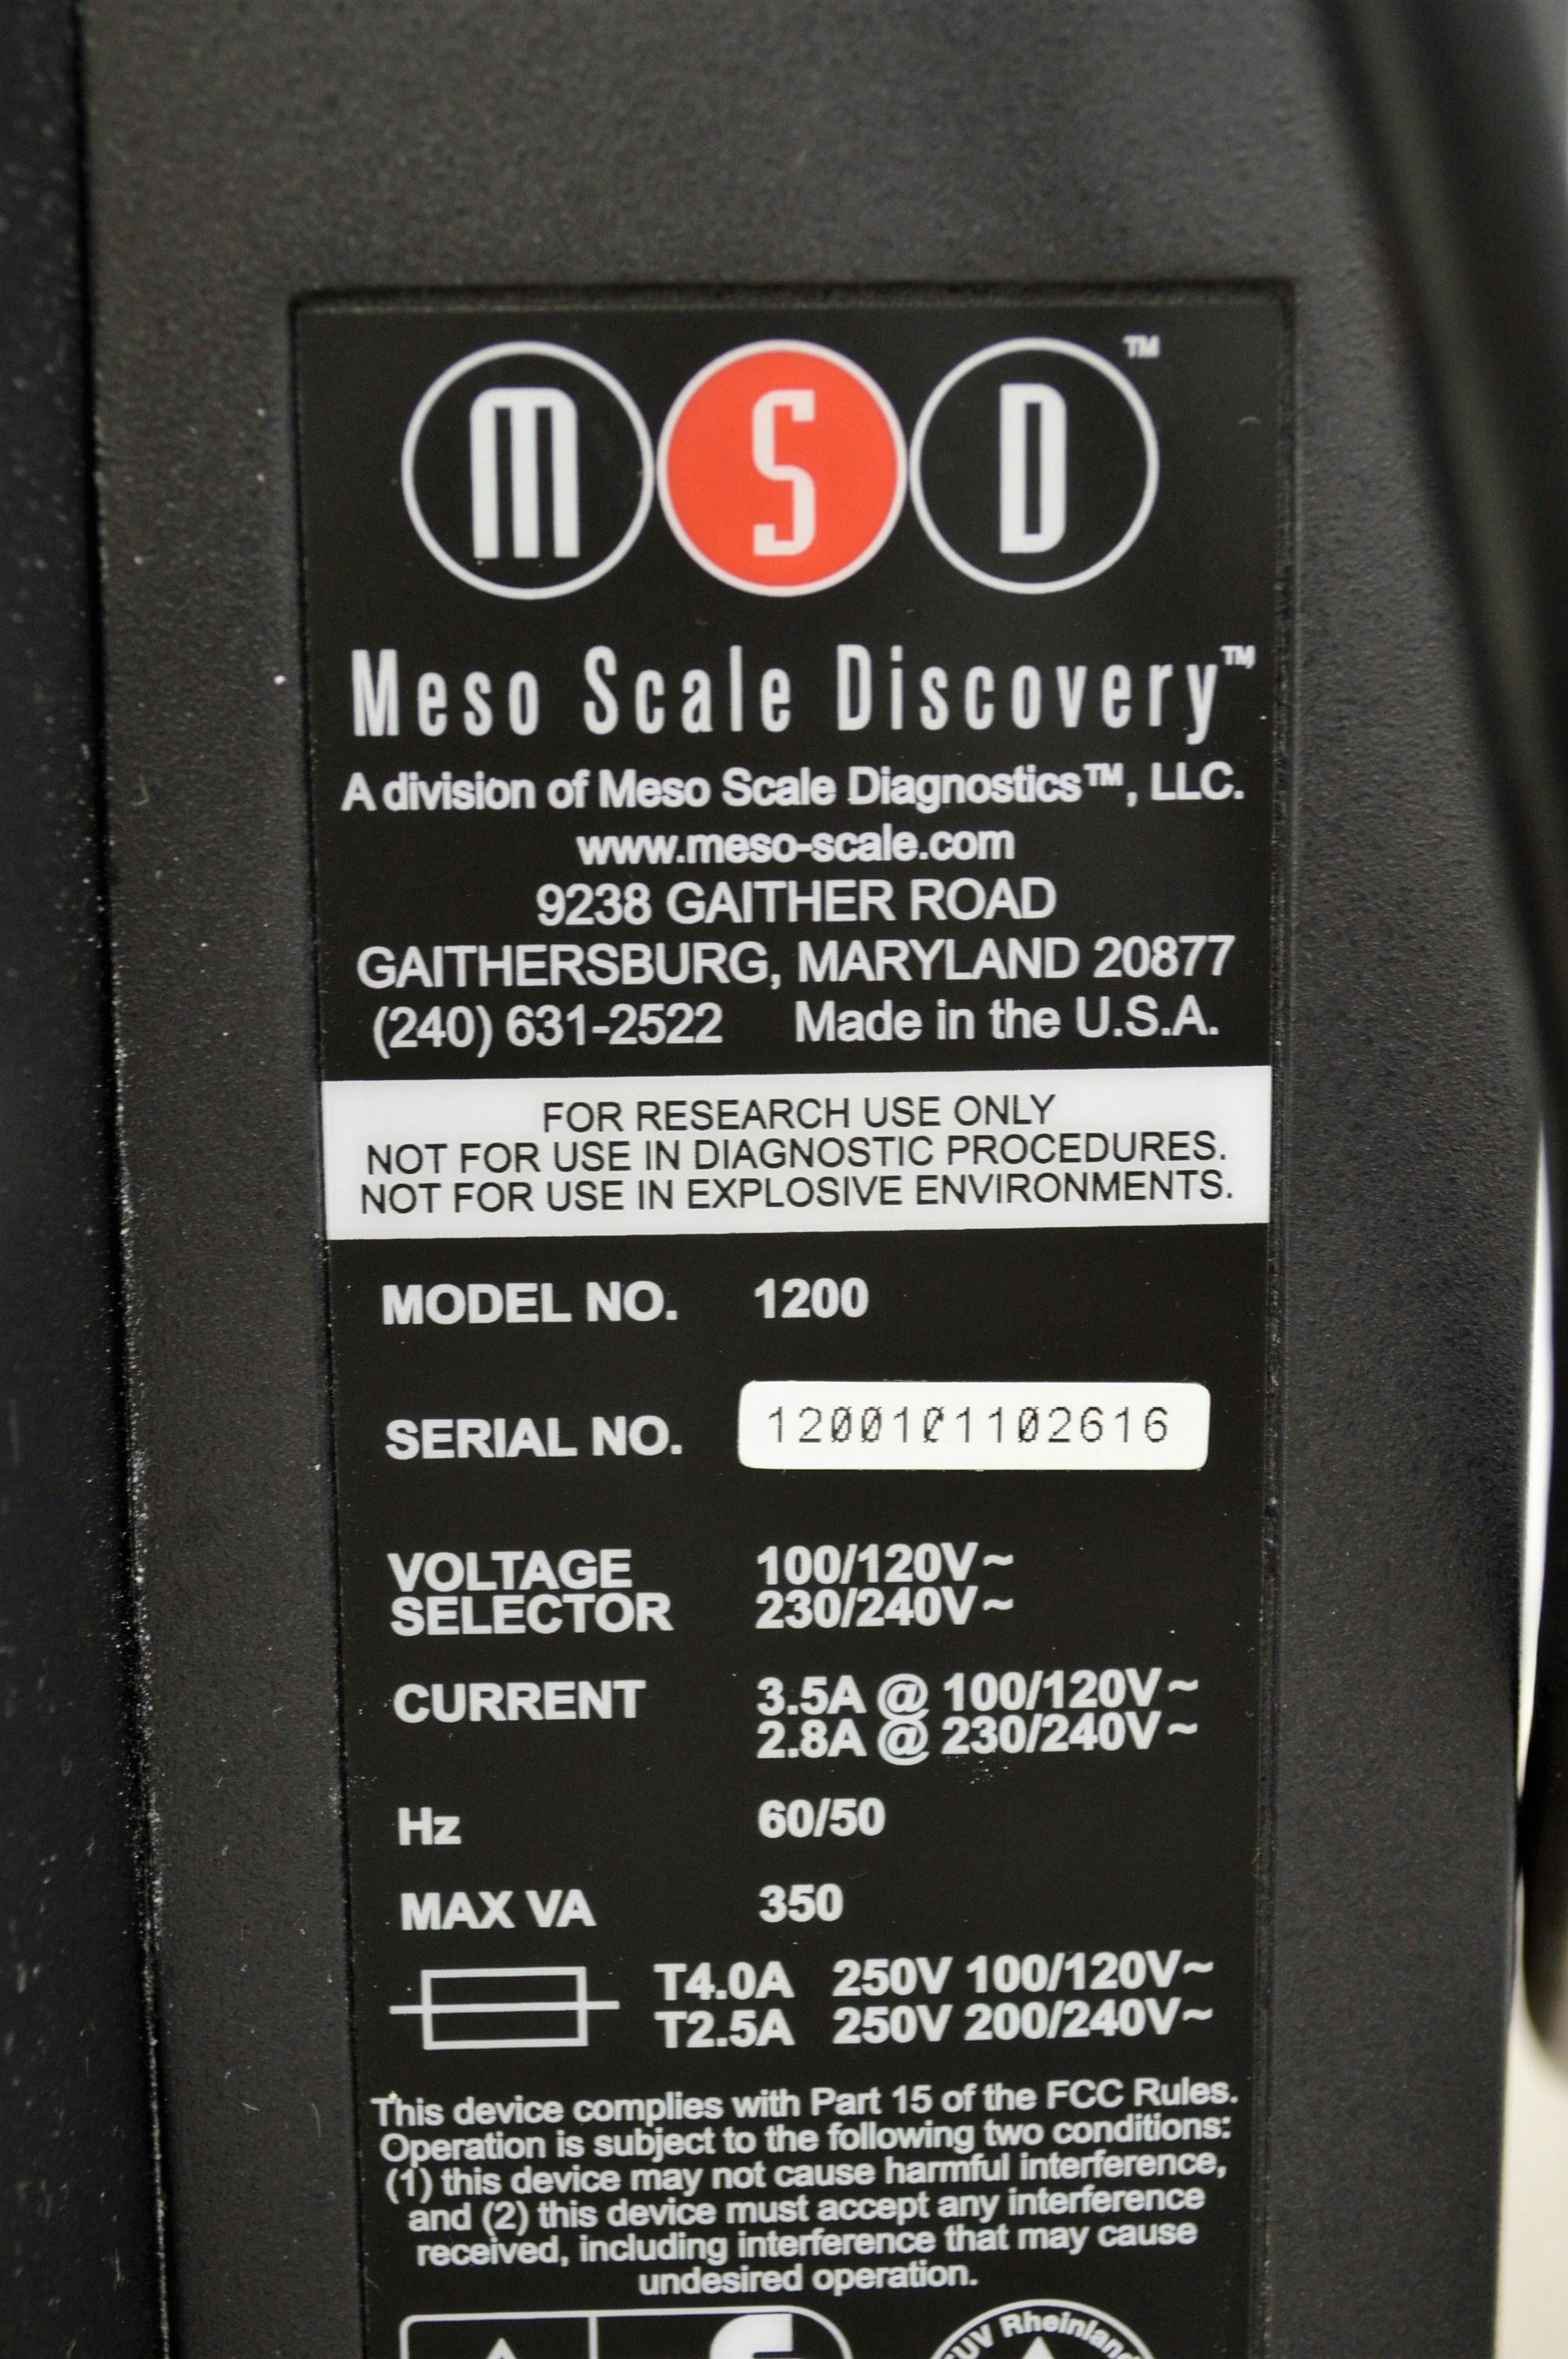 Buy it now Price MSD Meso